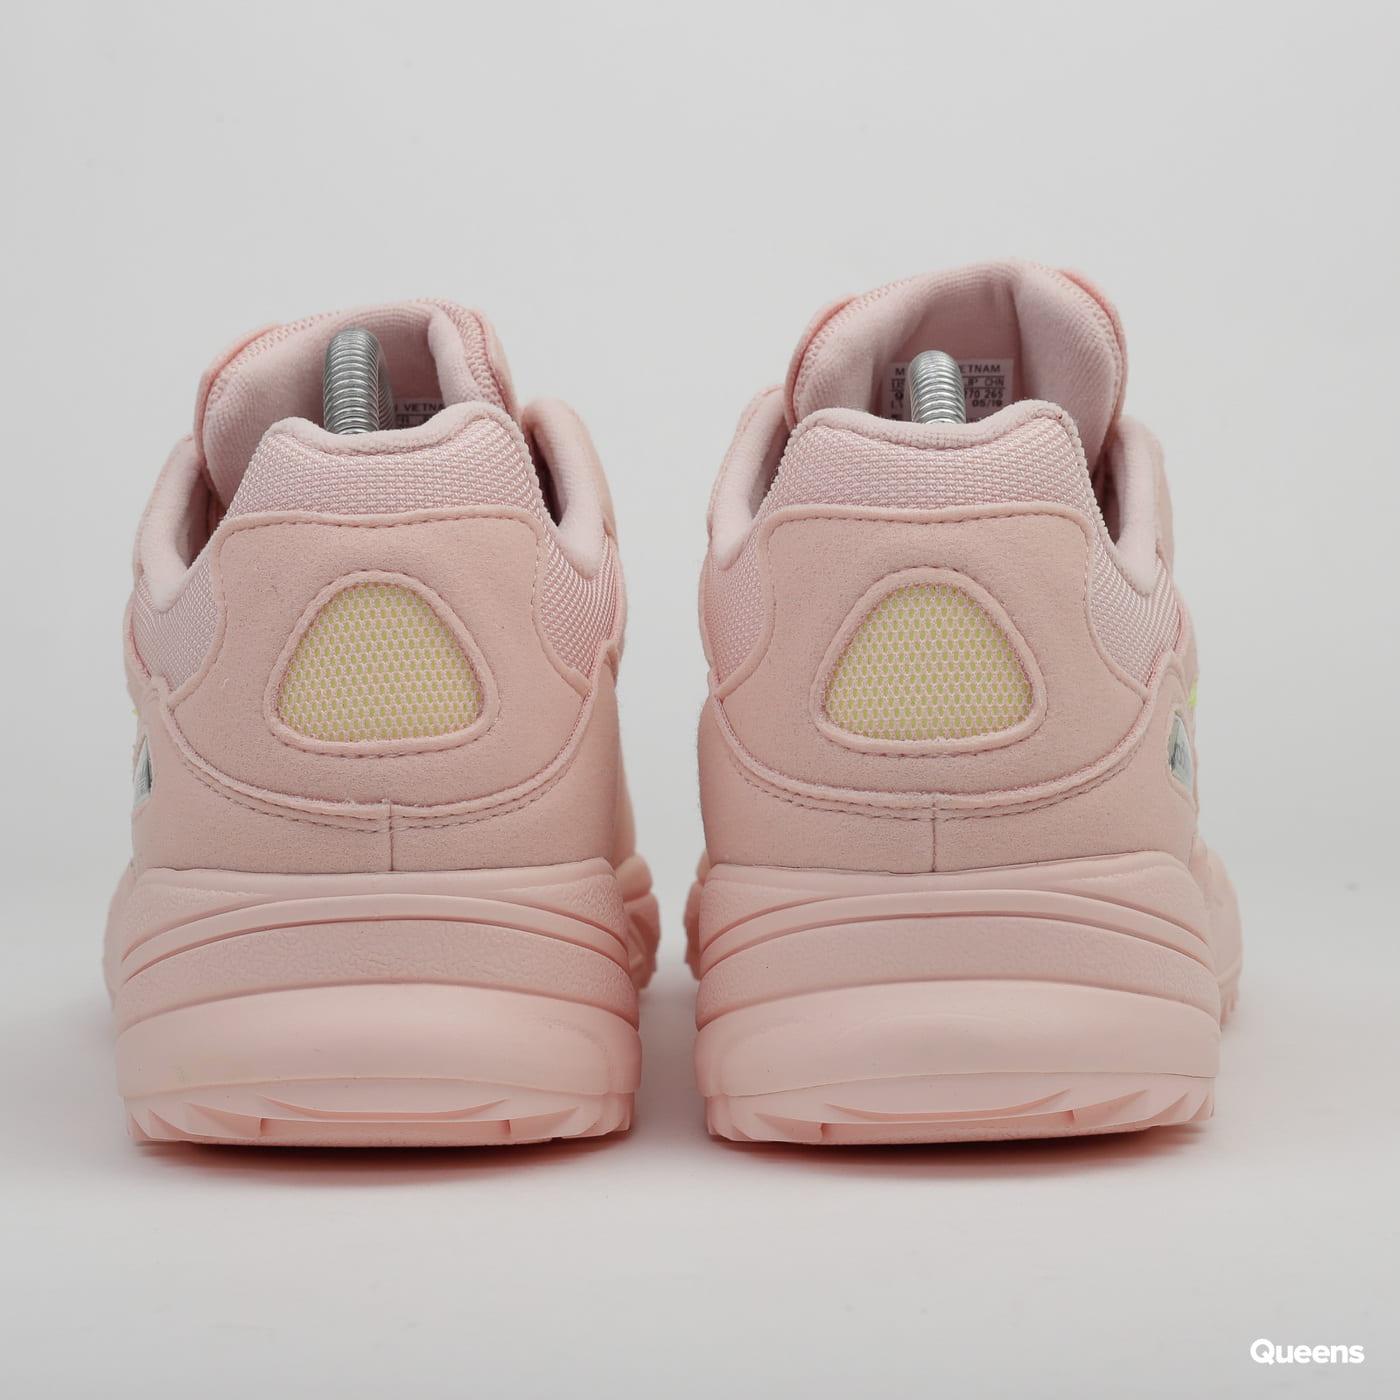 adidas Originals Yung-96 Chasm Trail vappnk / vappnk / hireye